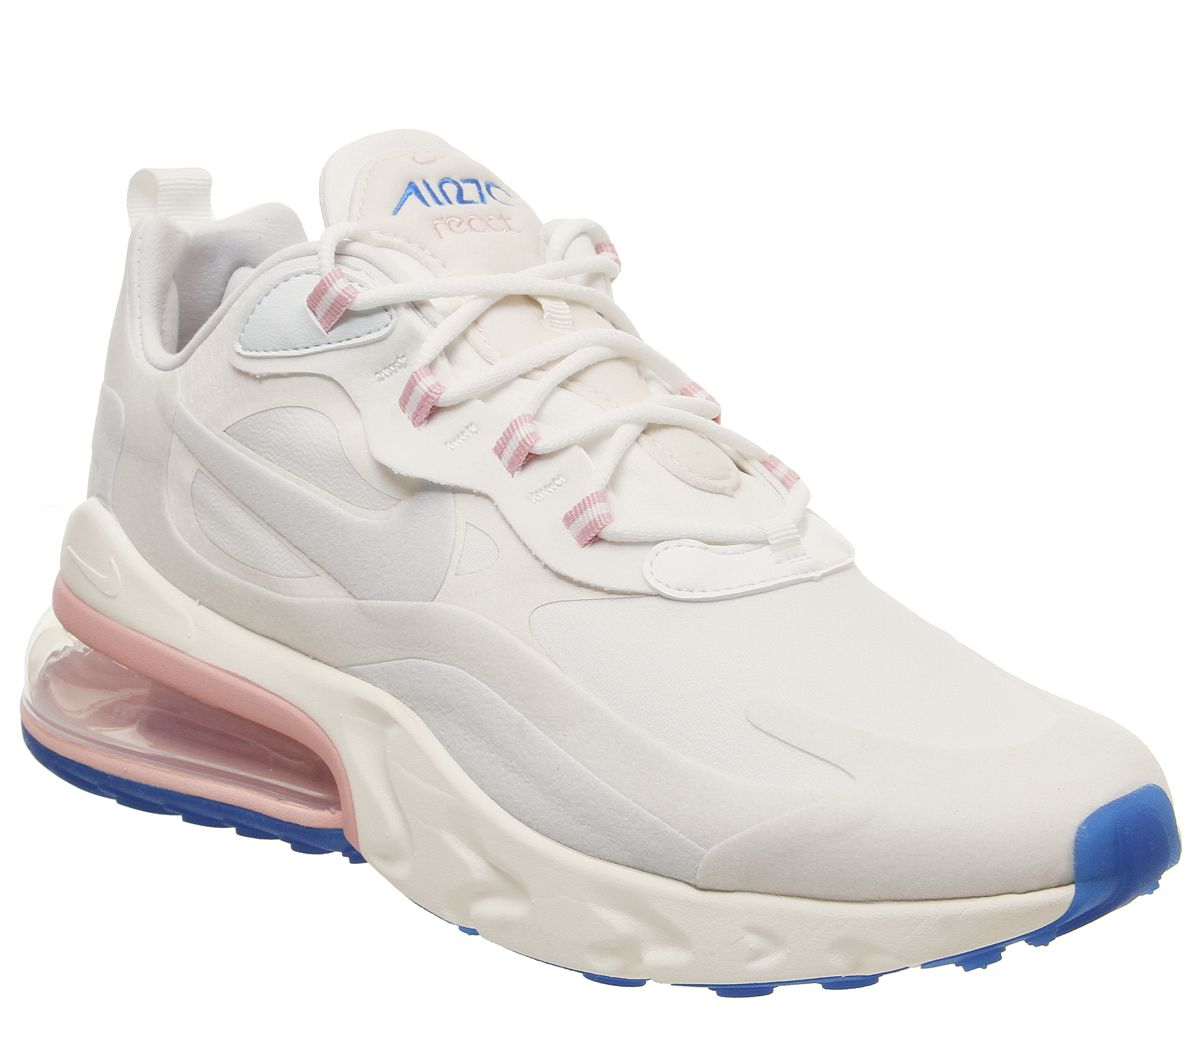 uk availability 4209d e6470 Nike Air Max 270 React Trainers White Ghost Aqua Phantom M ...